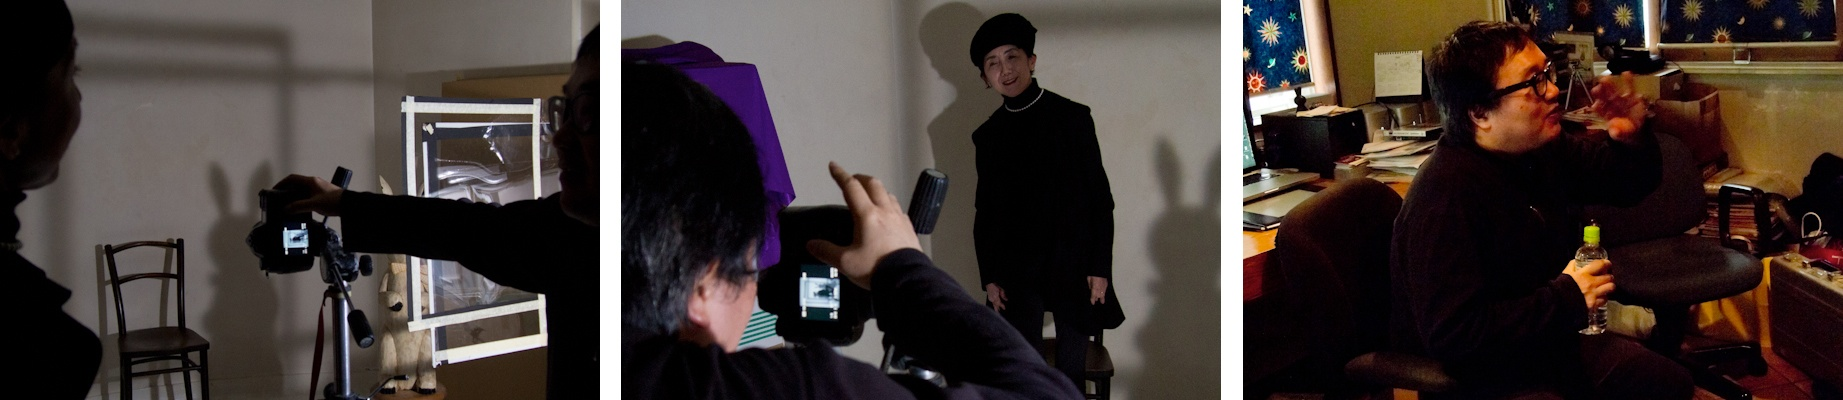 <b>この日のモデルは太田菜穂子さん。ウサギのぬいぐるみの影を組み合わせているのは、太田さんのイメージだと所氏はいう。太田さんはクレー・インクという会社の代表で、ギャラリー21の運営や「東京画」など写真表現プロジェクトの企画やディレクション、コーディネートなどをなさっている。いつ会っても隙のない着こなしでオシャレな方だ。そしてこの日も所くんの悩みに向けての適切なアドバイスが飛び交っていた。彼にとって大事な良き理解者のひとりだ。</b>